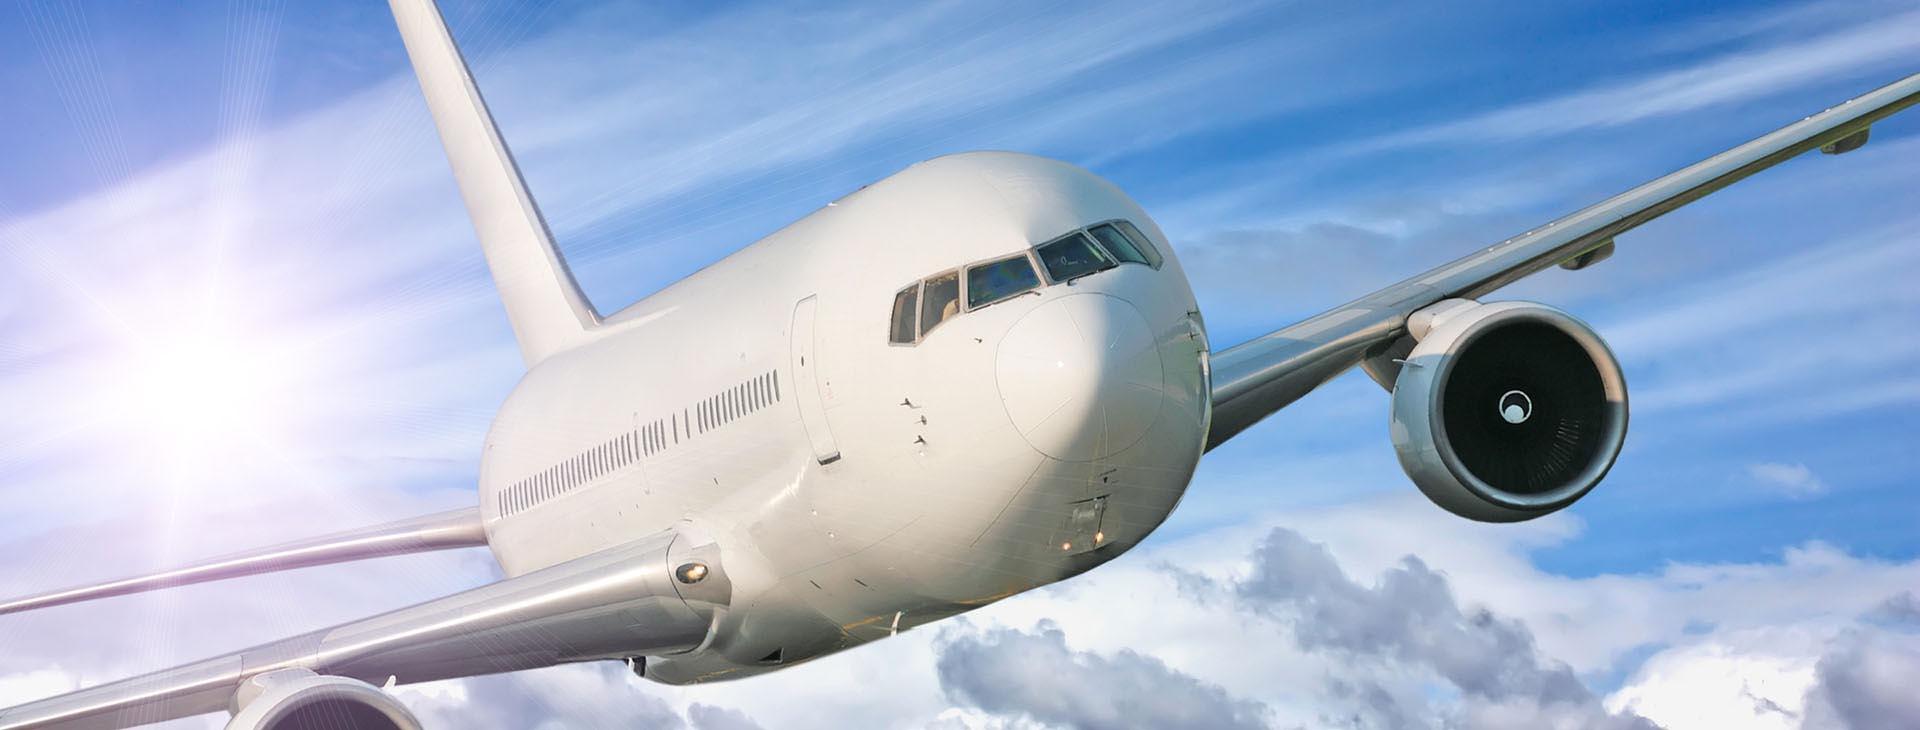 Book online your next flight